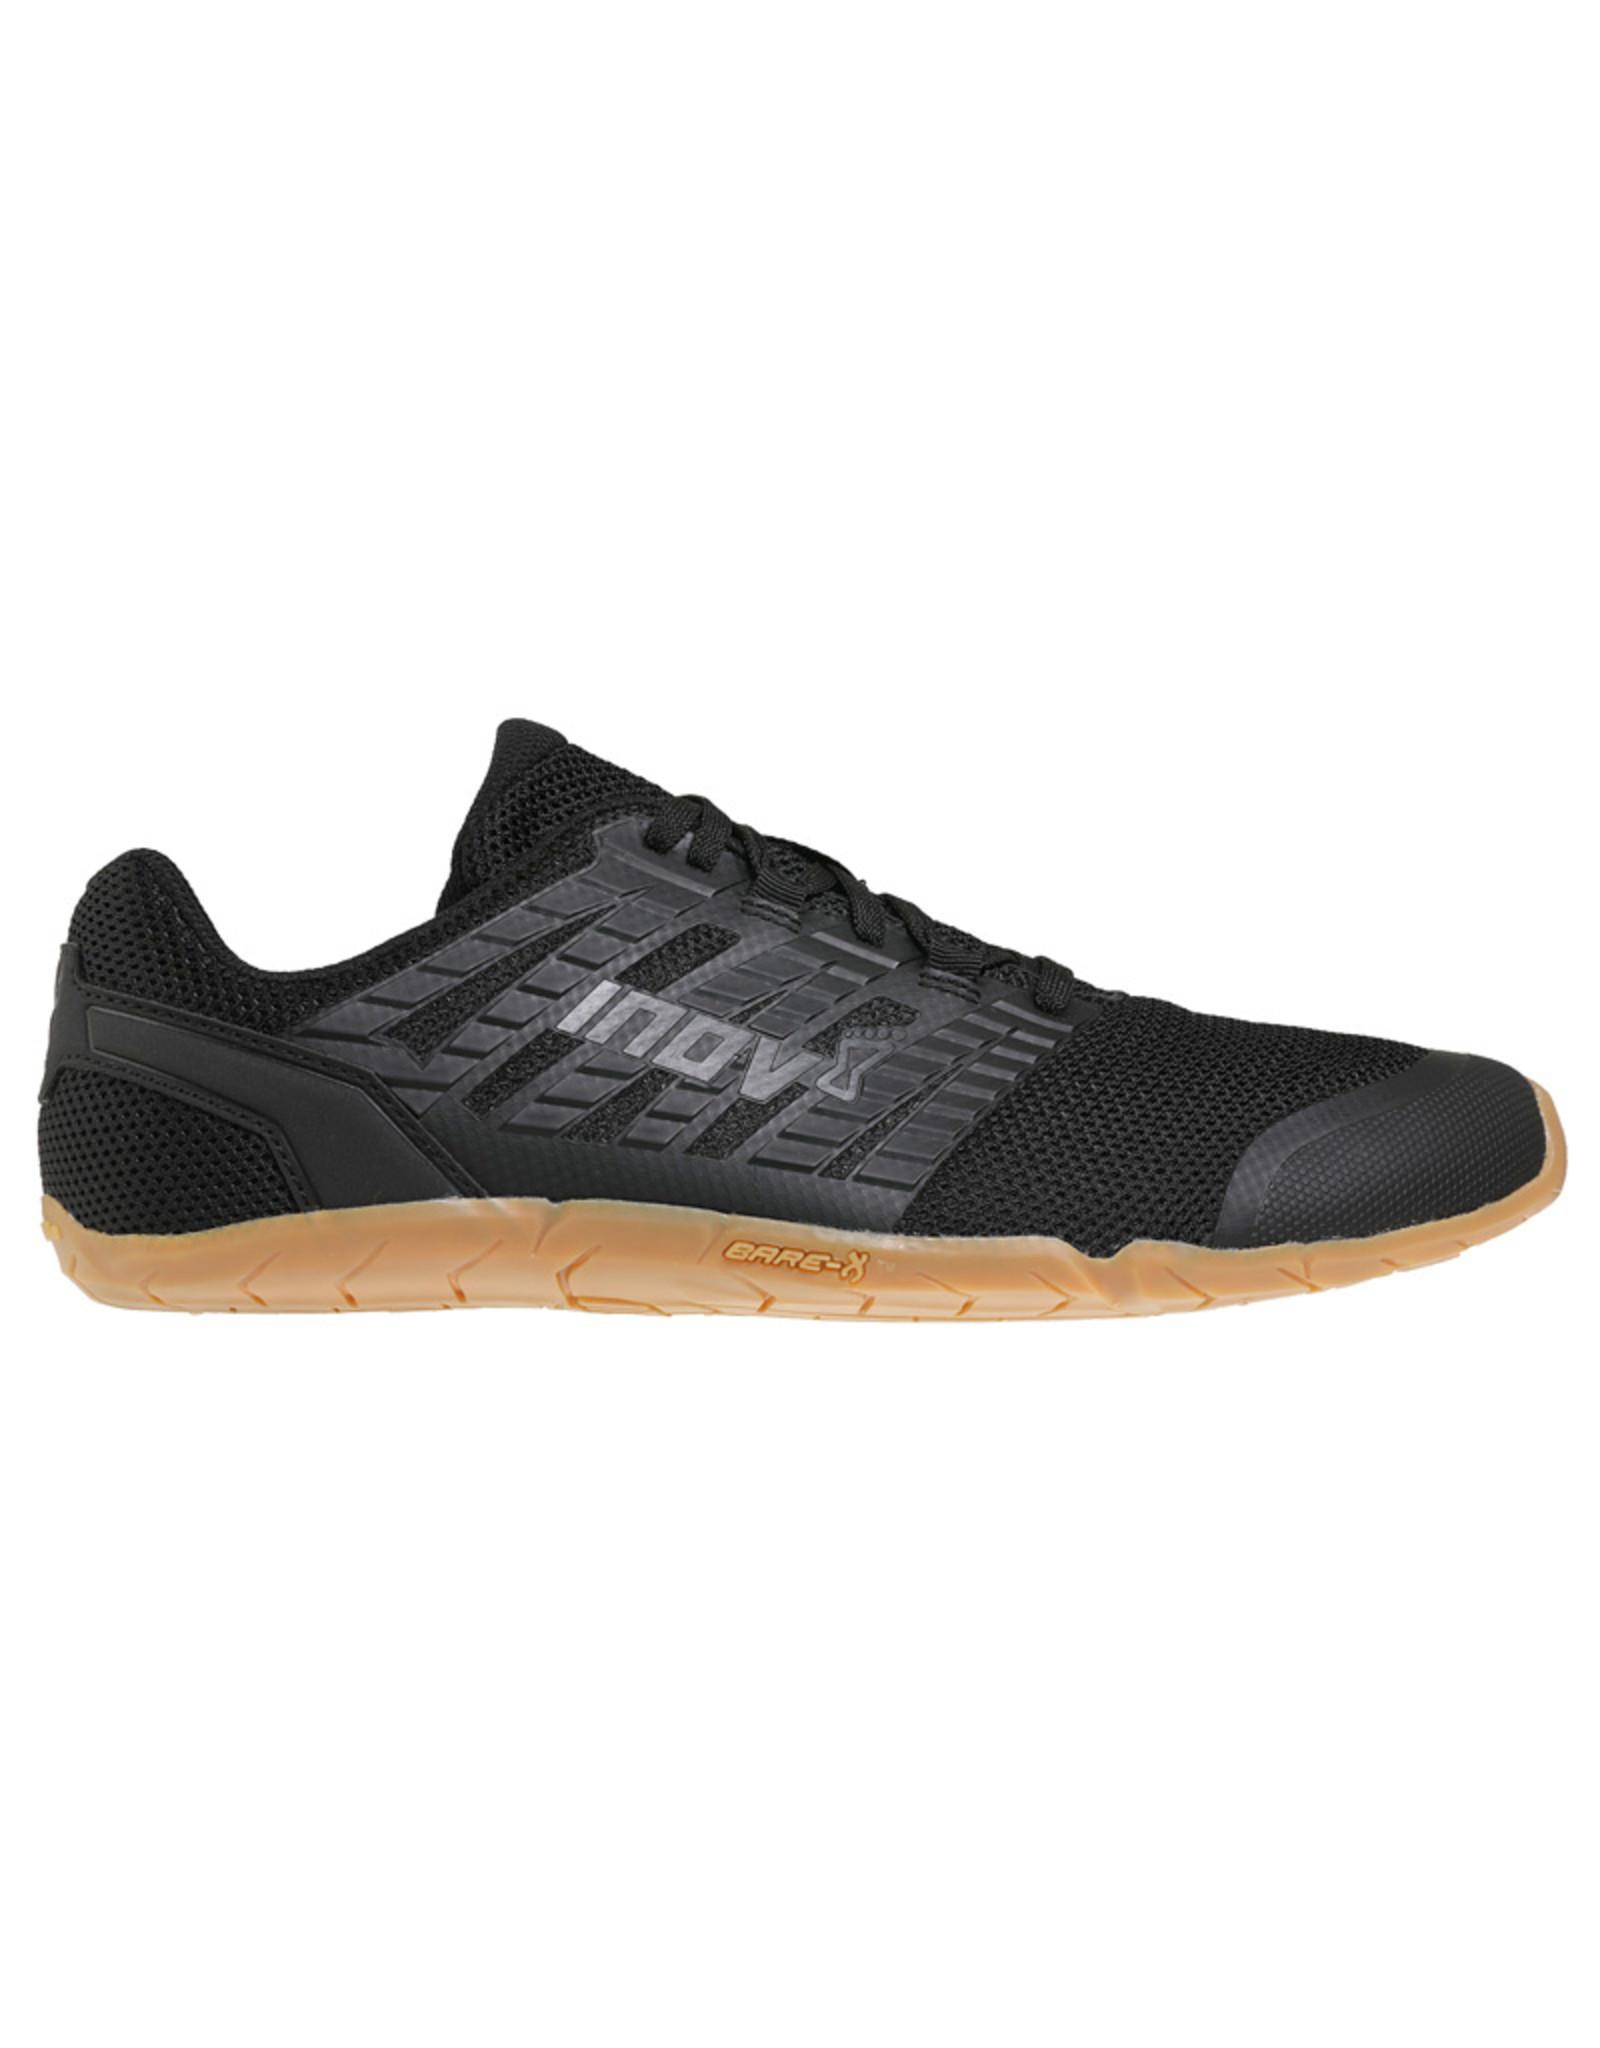 Inov-8 Bare XF 210 Noir Chaussure de fitness